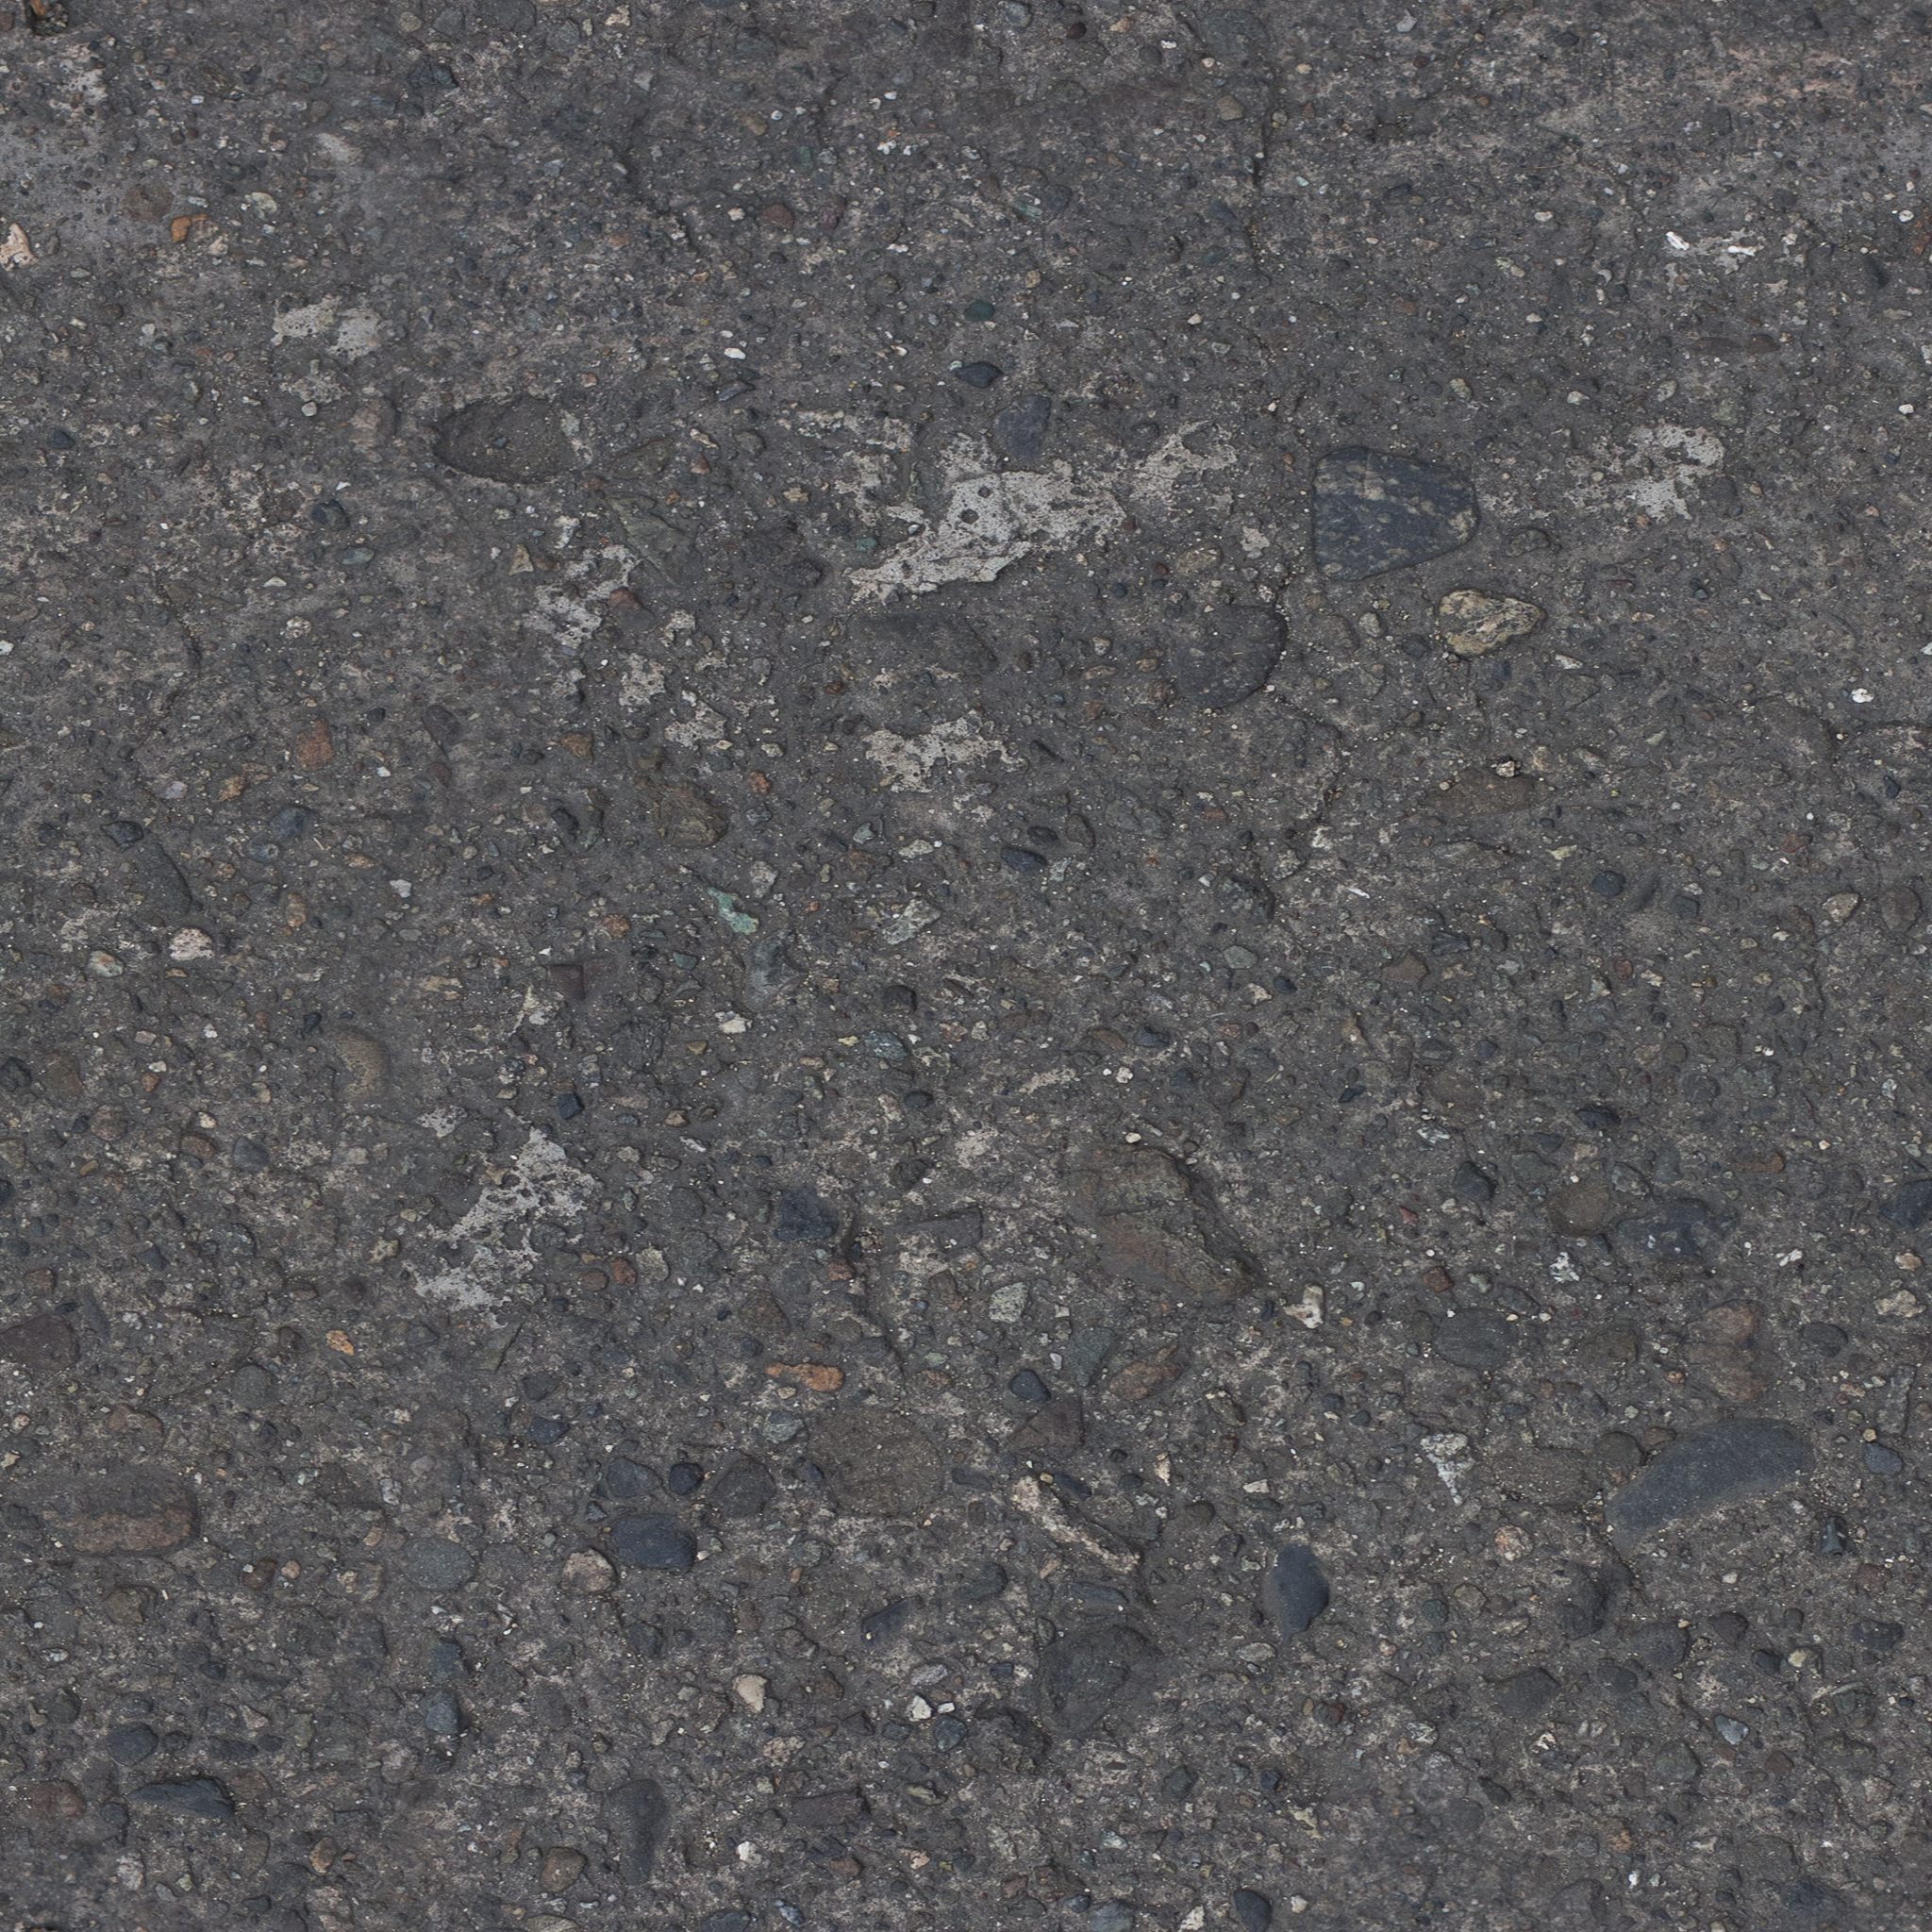 Damaged Dark Gray Concrete.jpg